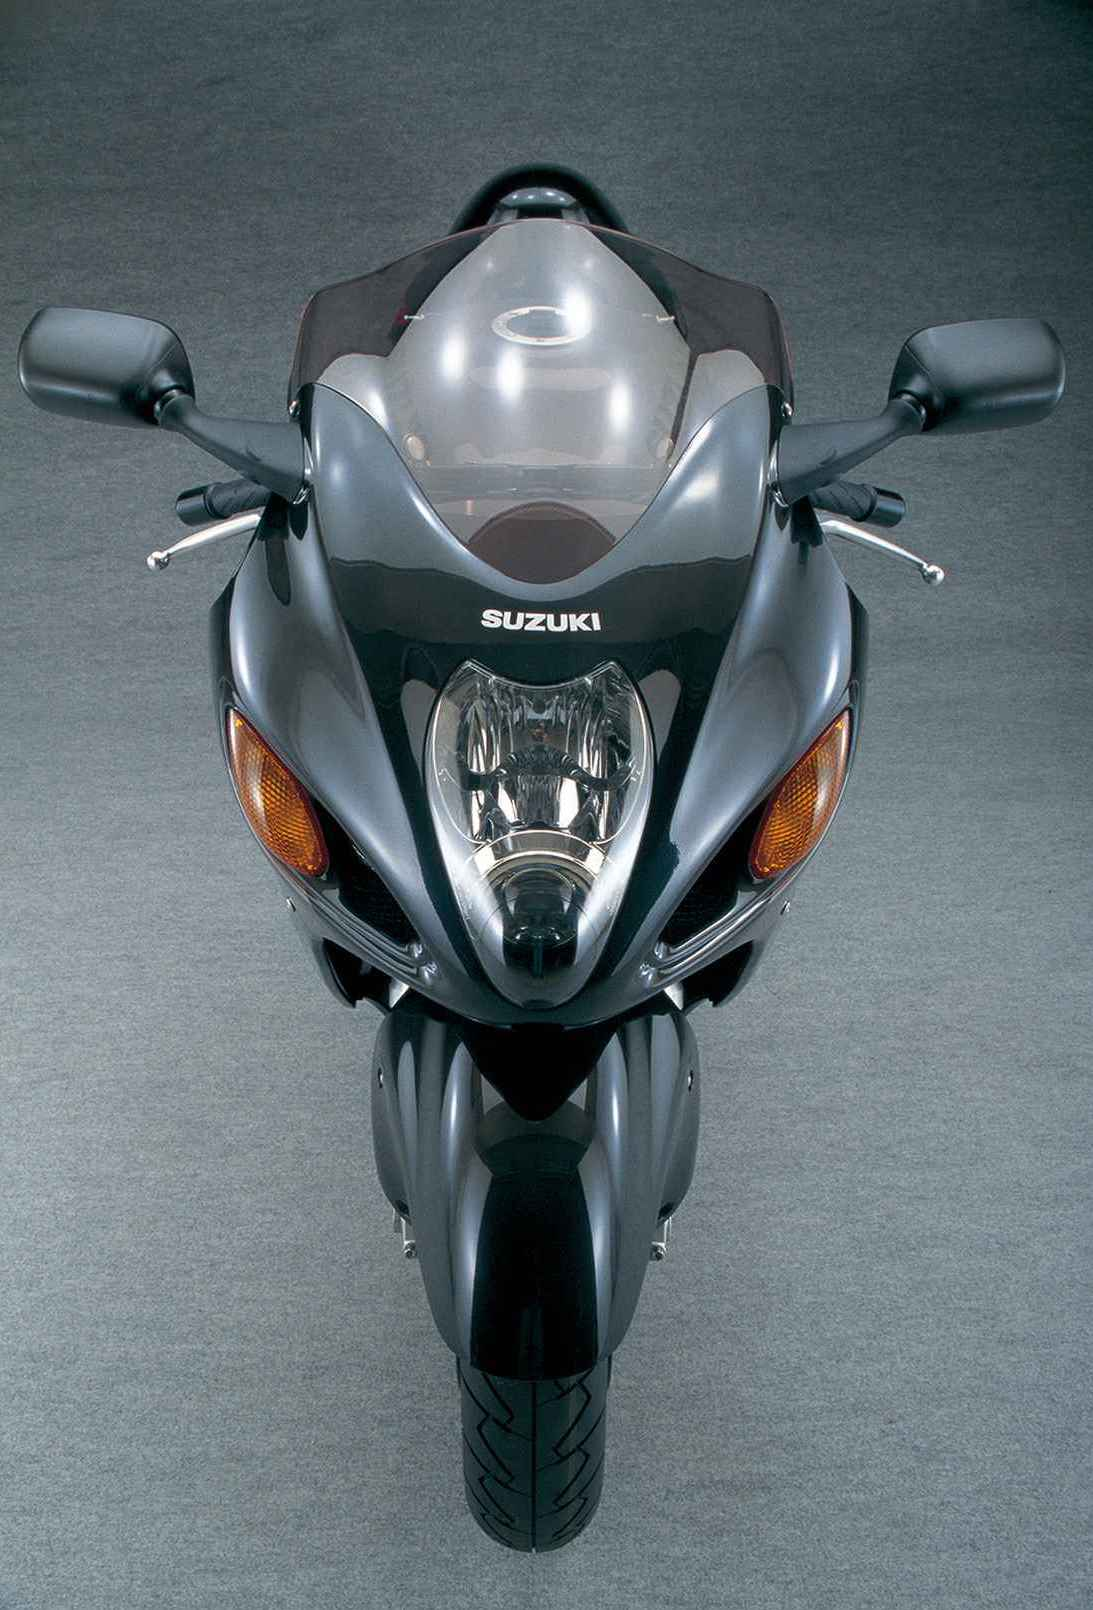 Images : 3番目の画像 - 1999年SUZUKI GSX1300R HAYABUSA - LAWRENCE - Motorcycle x Cars + α = Your Life.